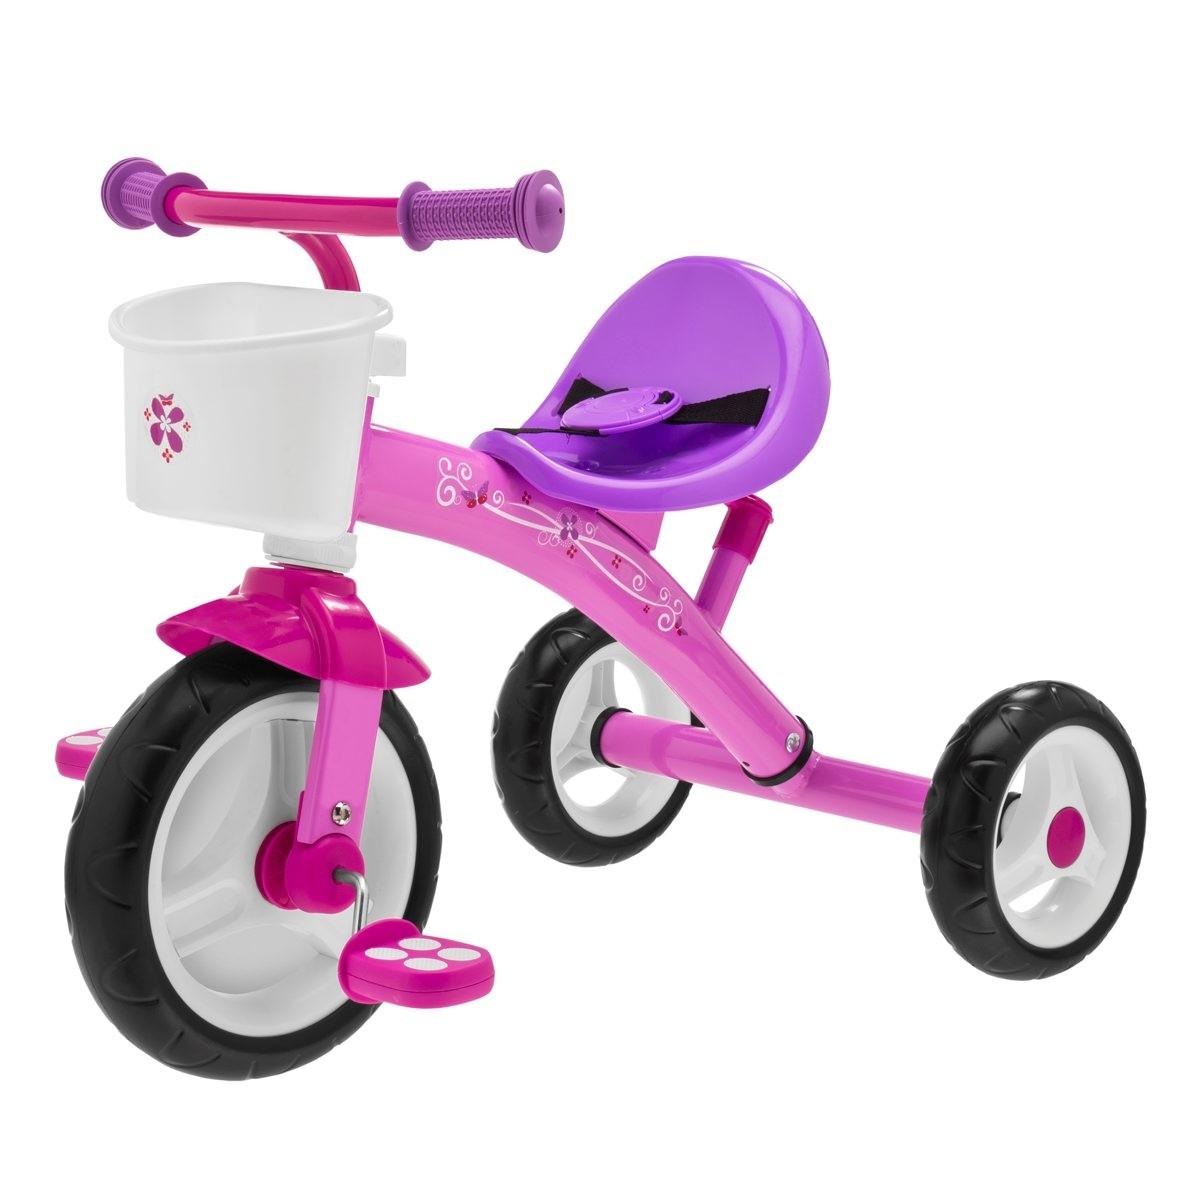 Image of Triciclo U-GO Rosa CHICCO 18M+